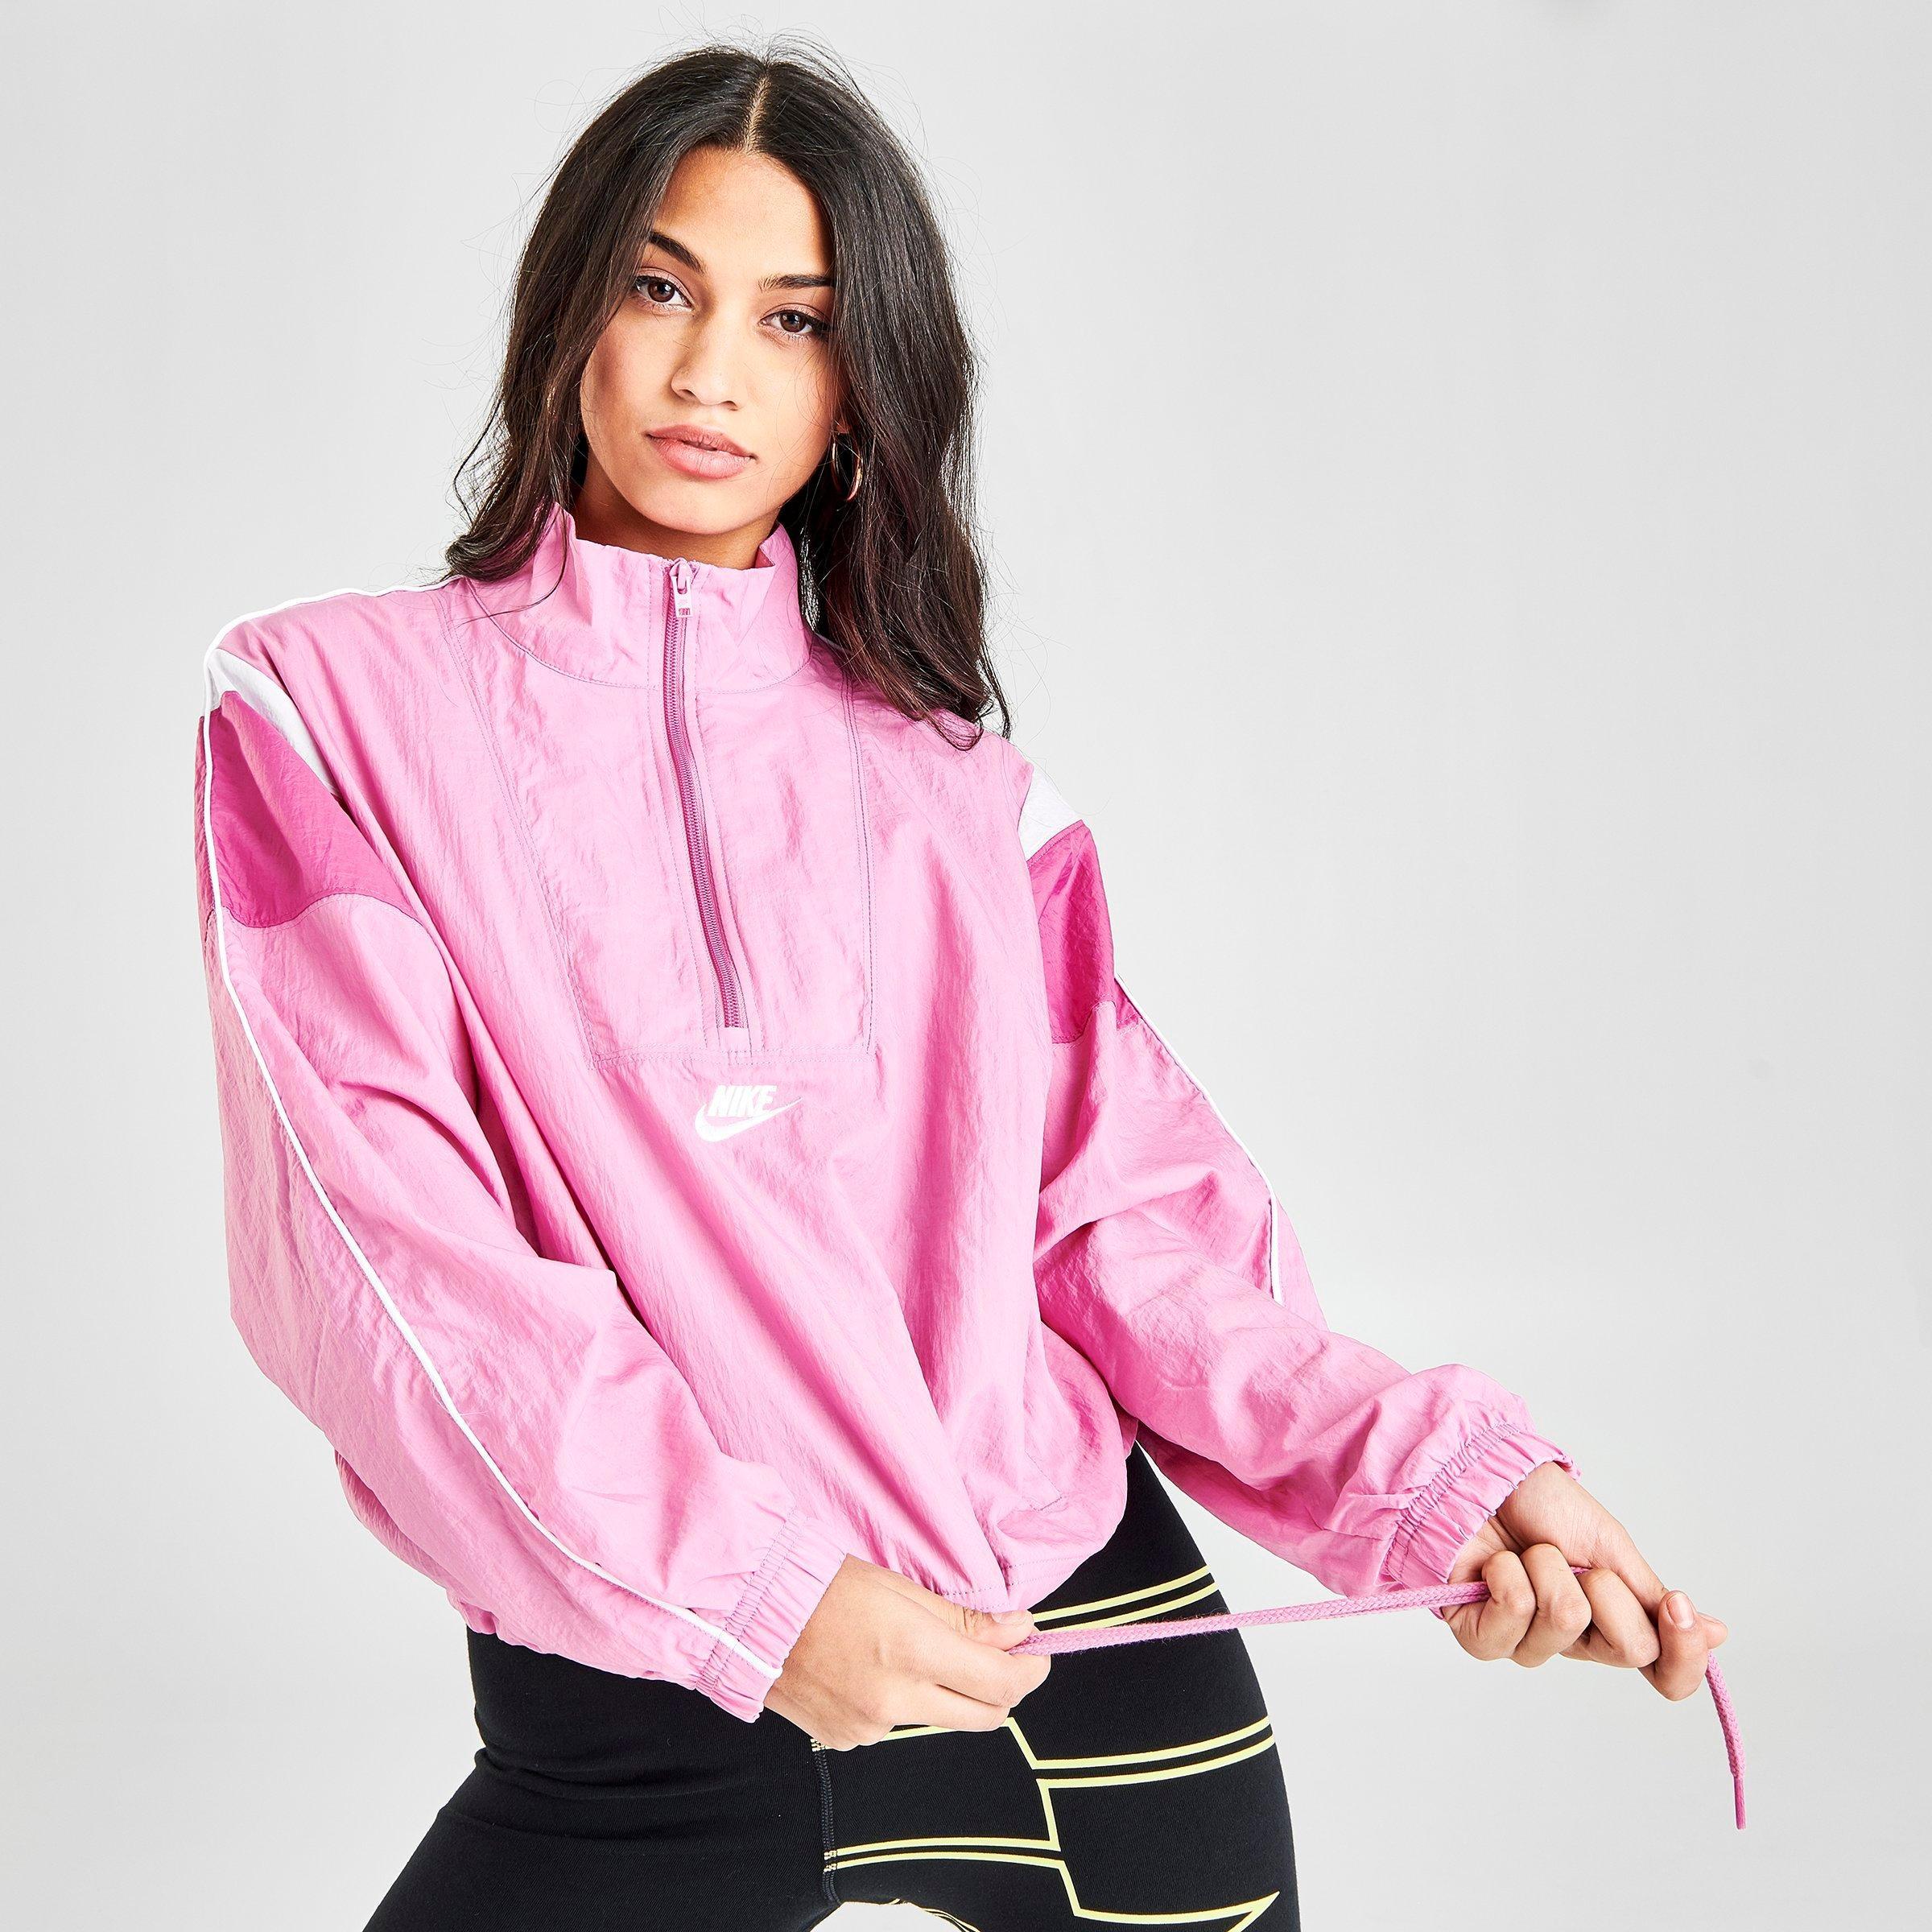 Ciudadano Traducción sufrir  Nike Nike Women's Sportswear Woven Heritage Wind Jacket in Pink Size Small  from Finish Line   shefinds